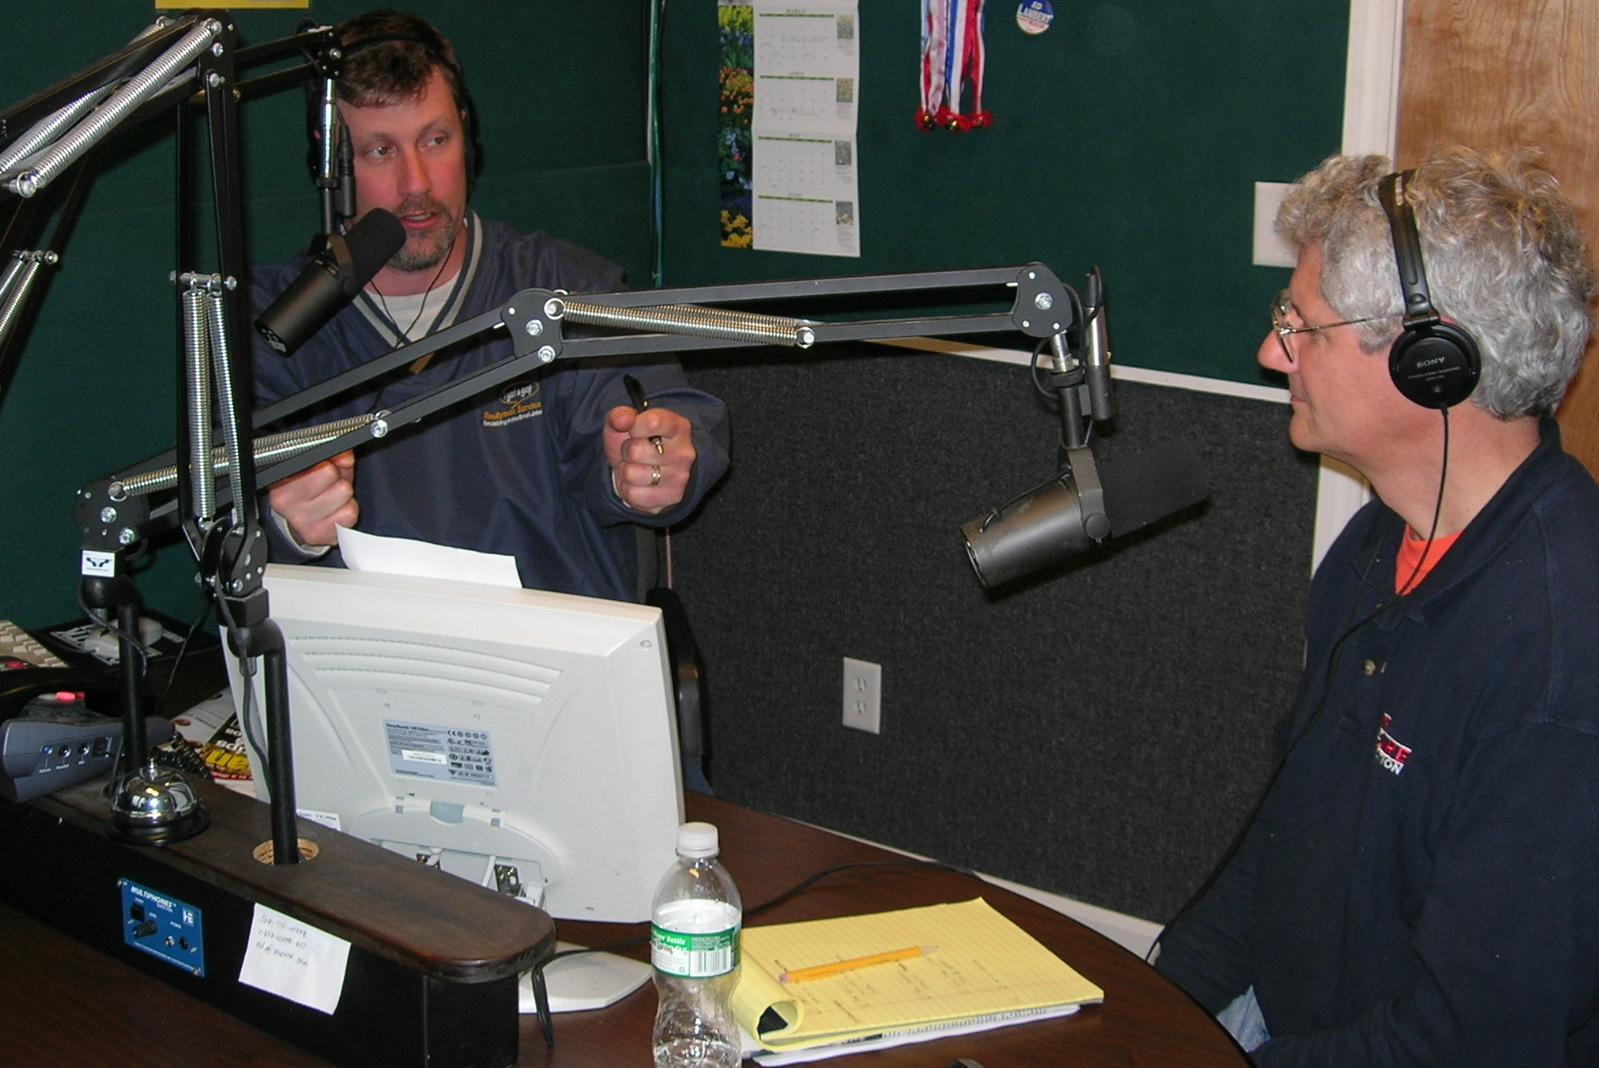 Larry Egan and John O'Rourke the Handyman Hotline guys